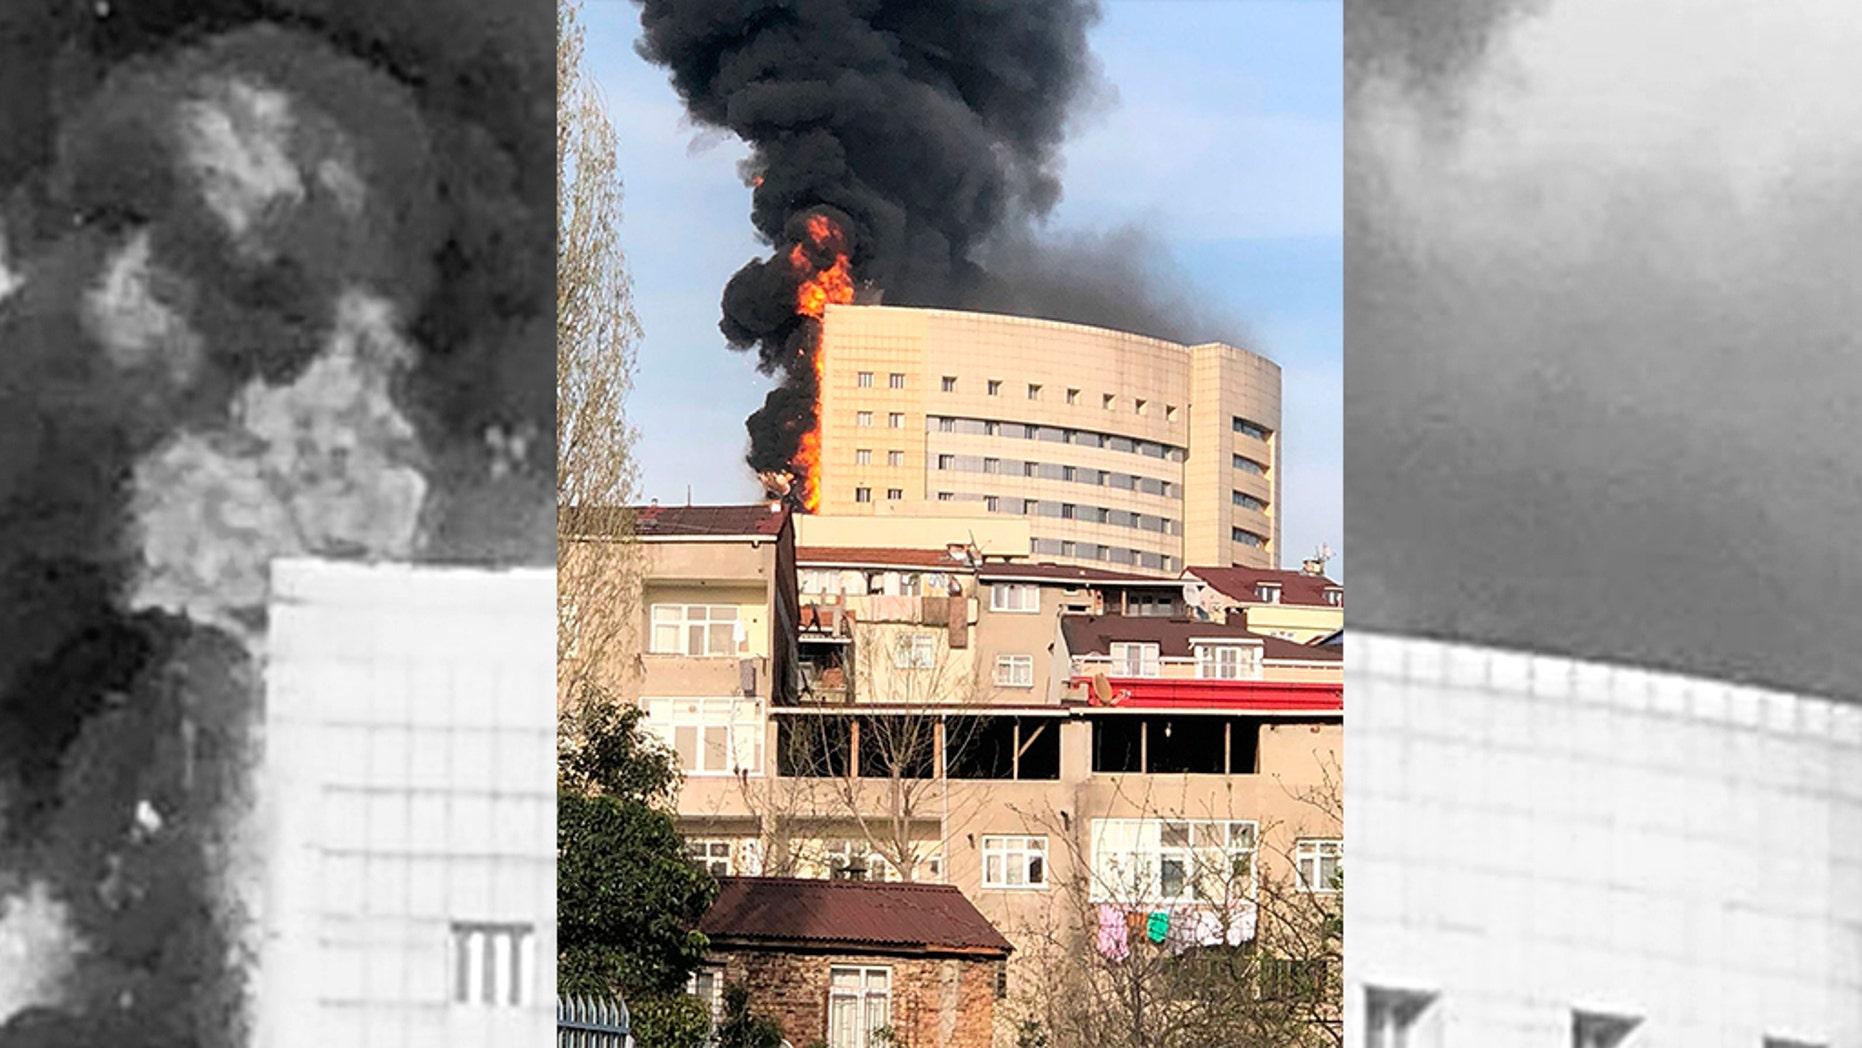 A fire engulfing a facade of the Taksim Ilk Yardim hospital in the Gaziosmanpasa district in Istanbul, Thursday, April 5, 2018.